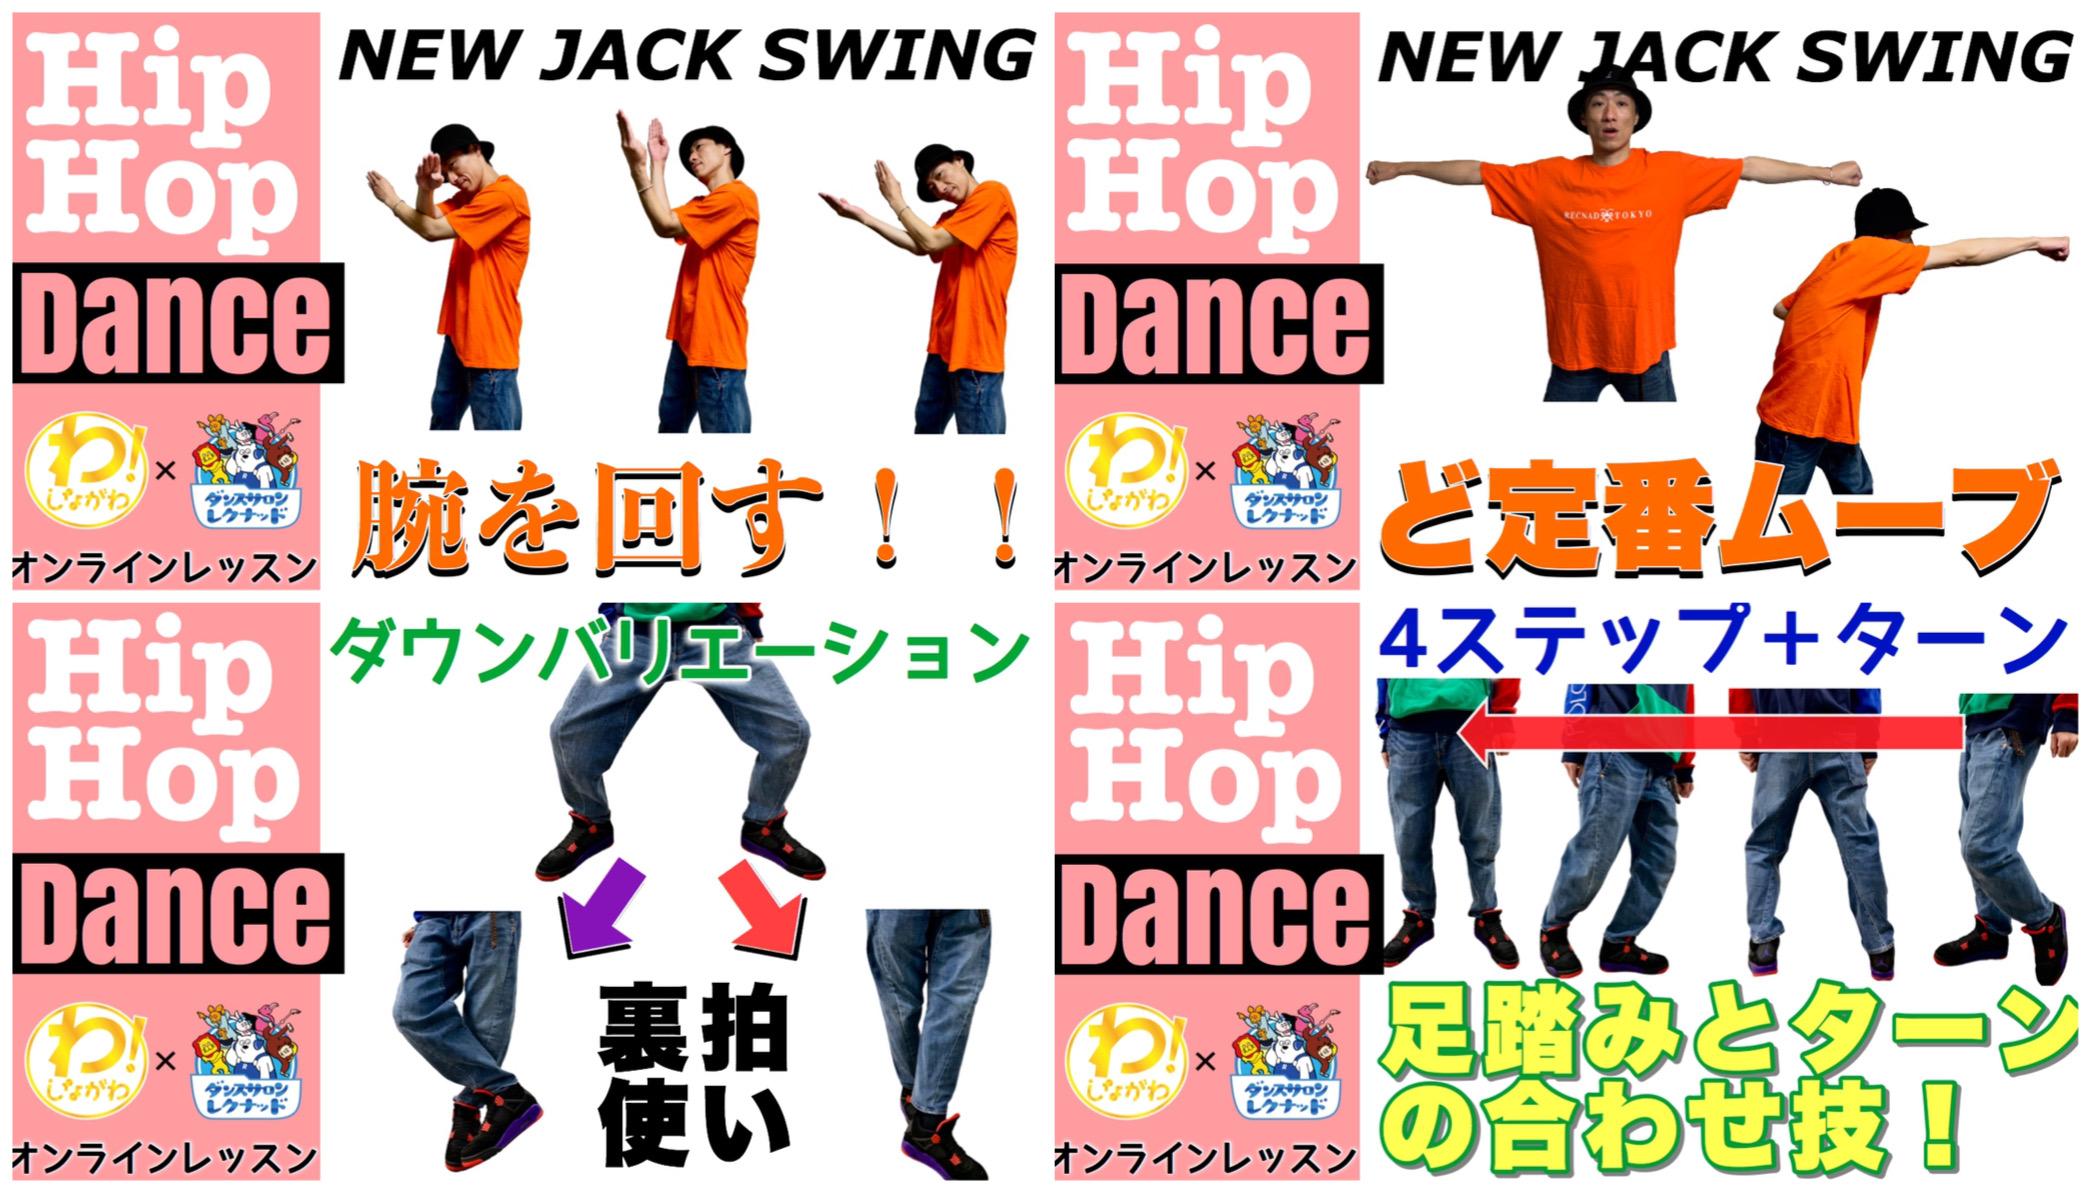 NEW JACK SWING